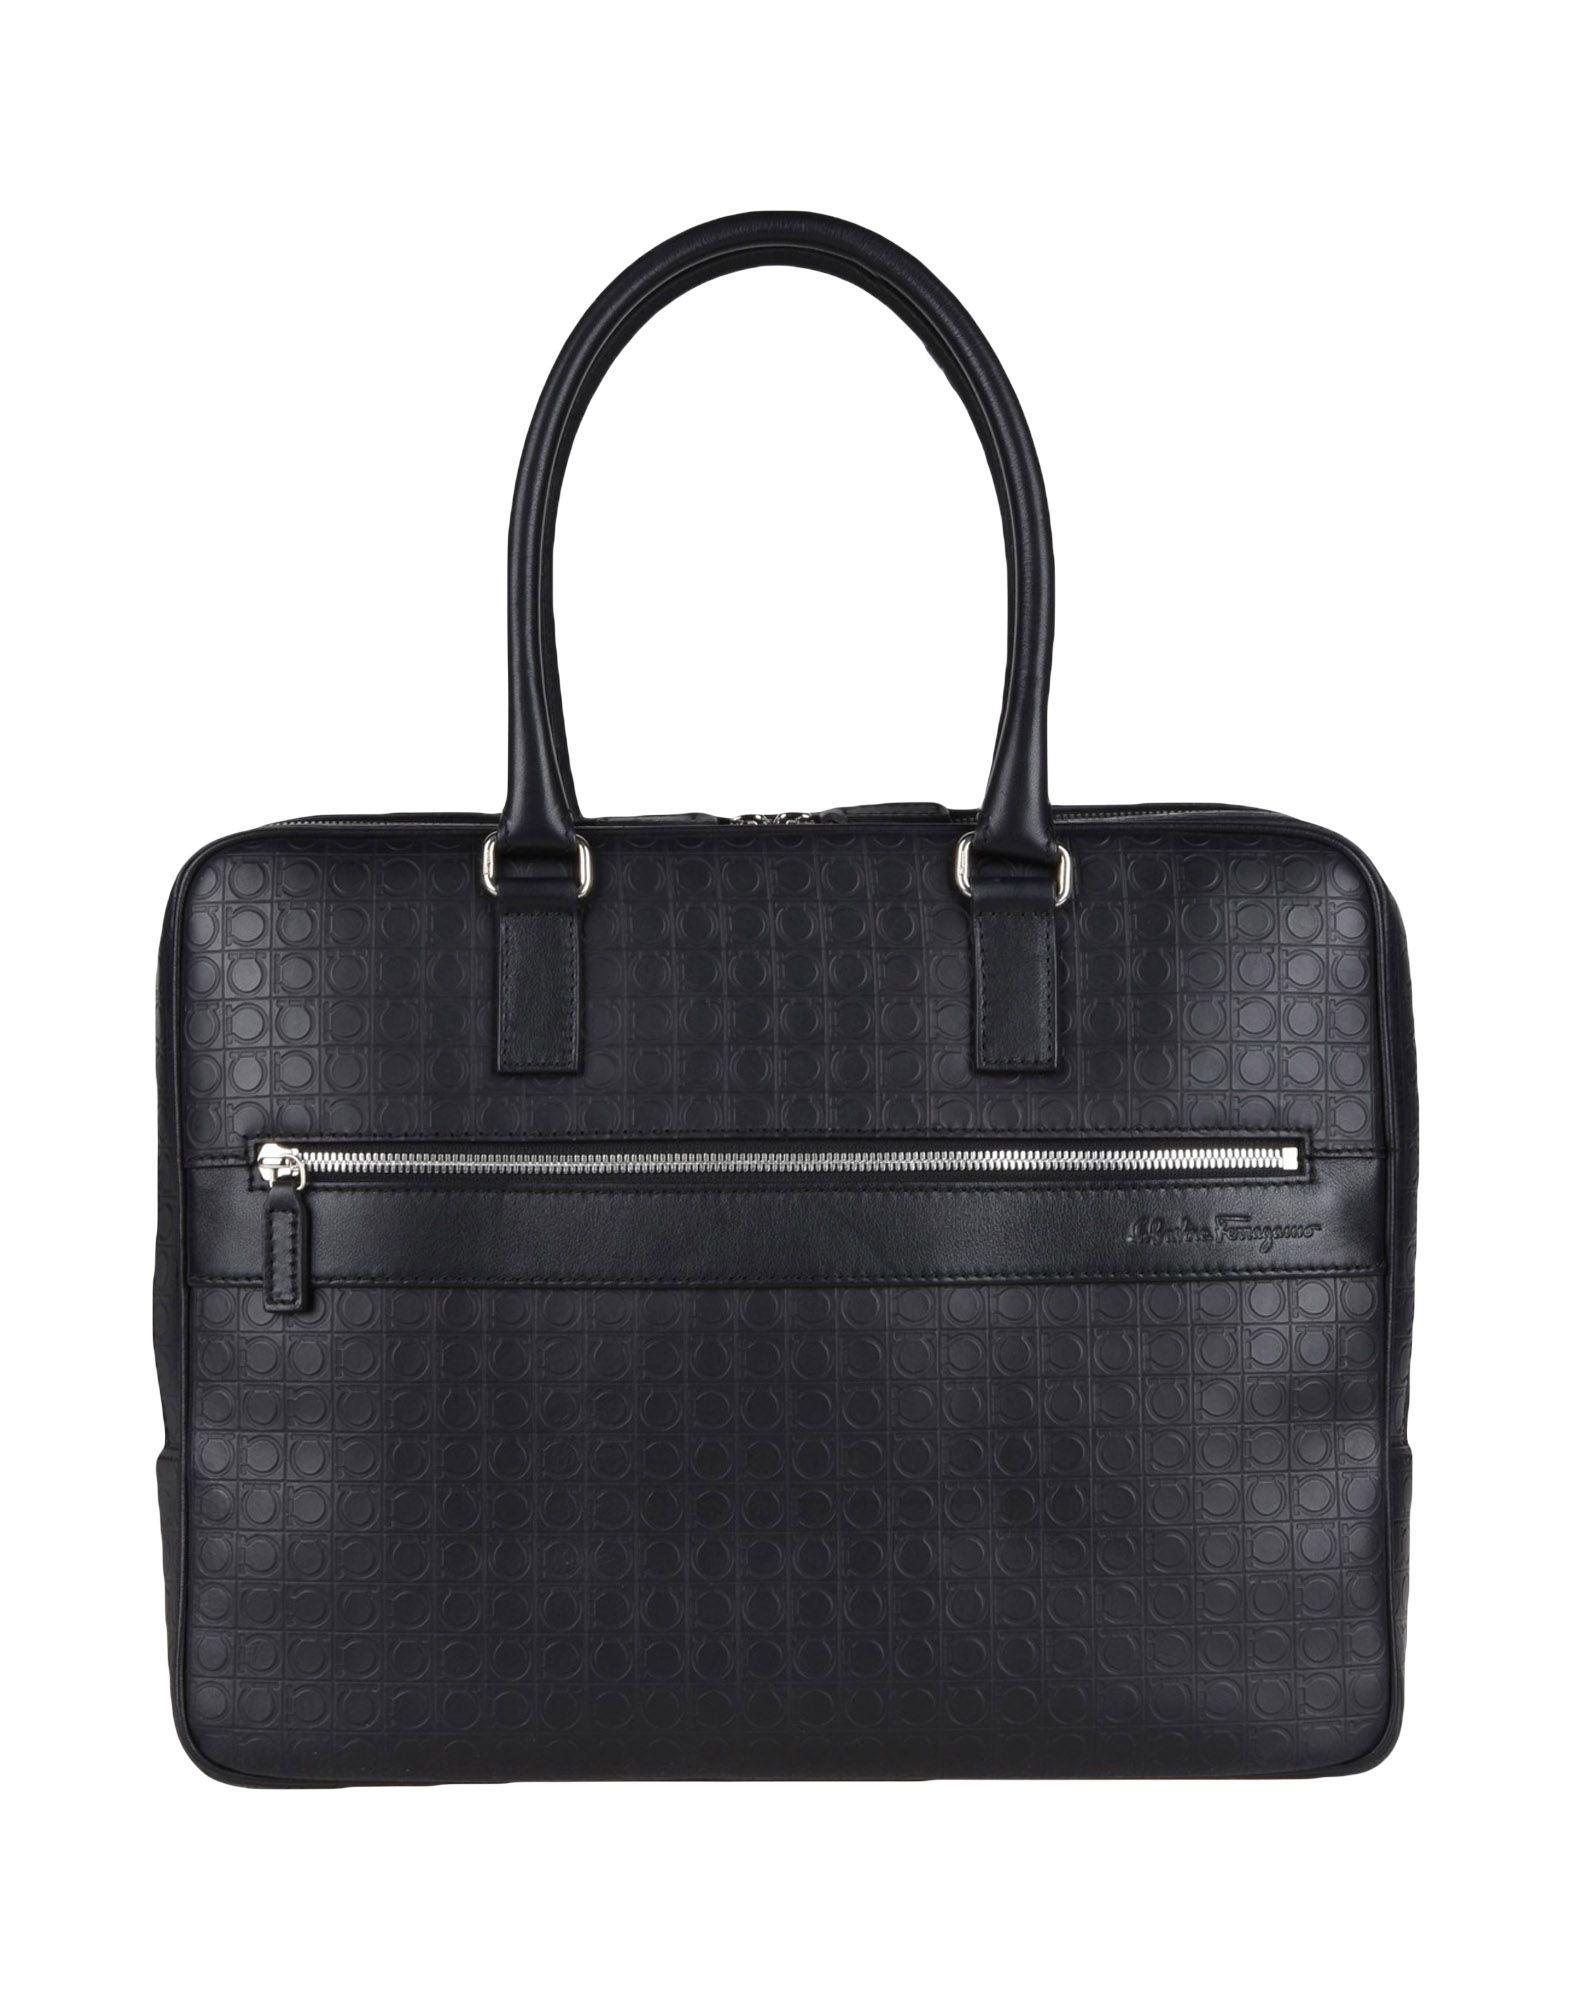 Salvatore Ferragamo Work Bags In Black